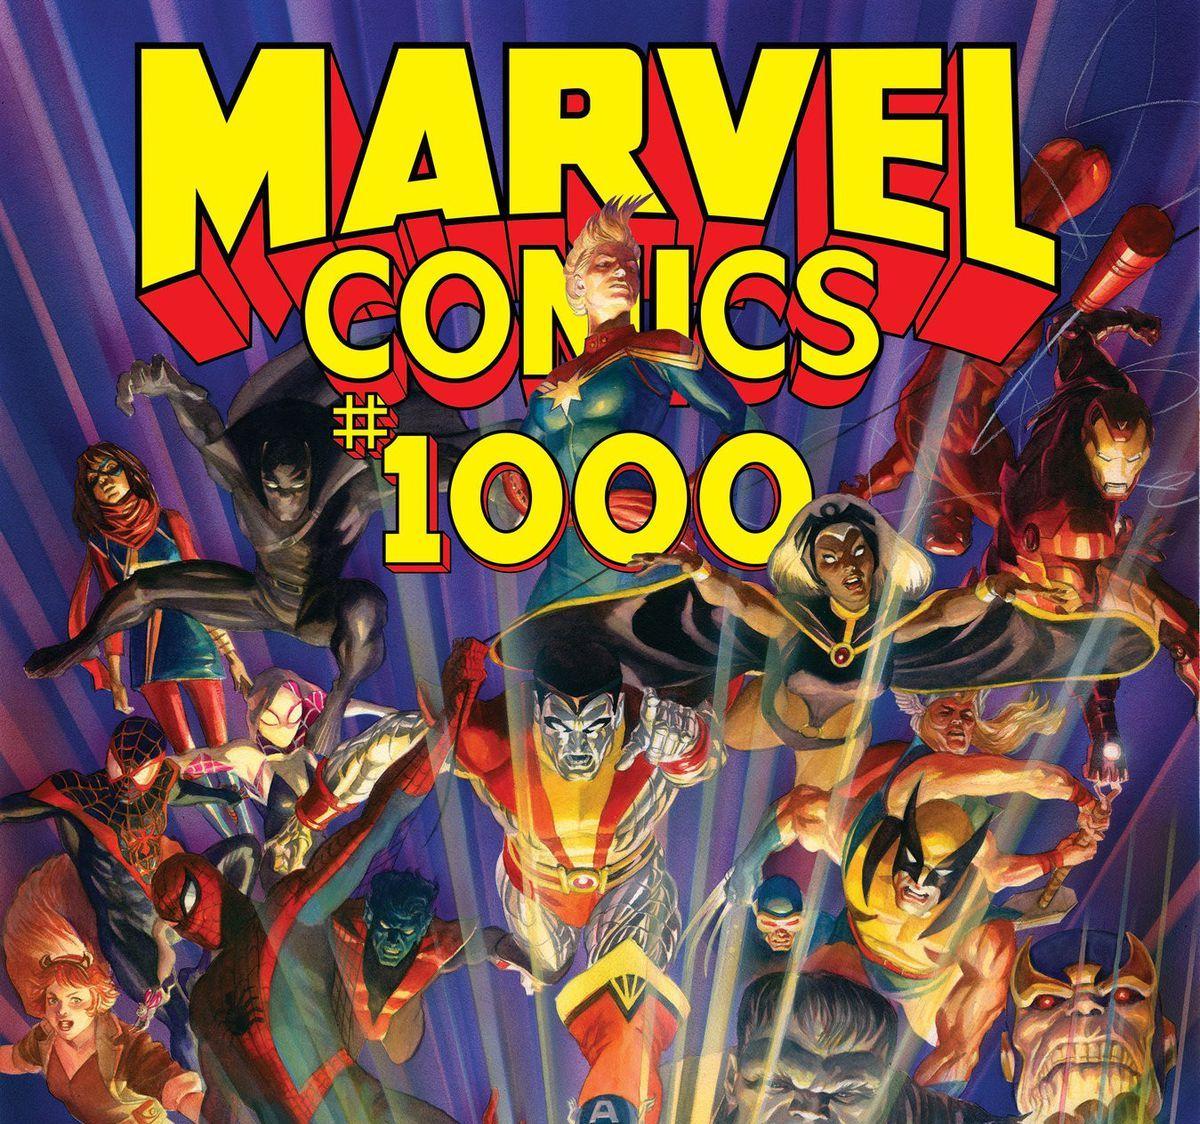 Lucky_Target_Comics_Marvel_Comics_1000.jpg